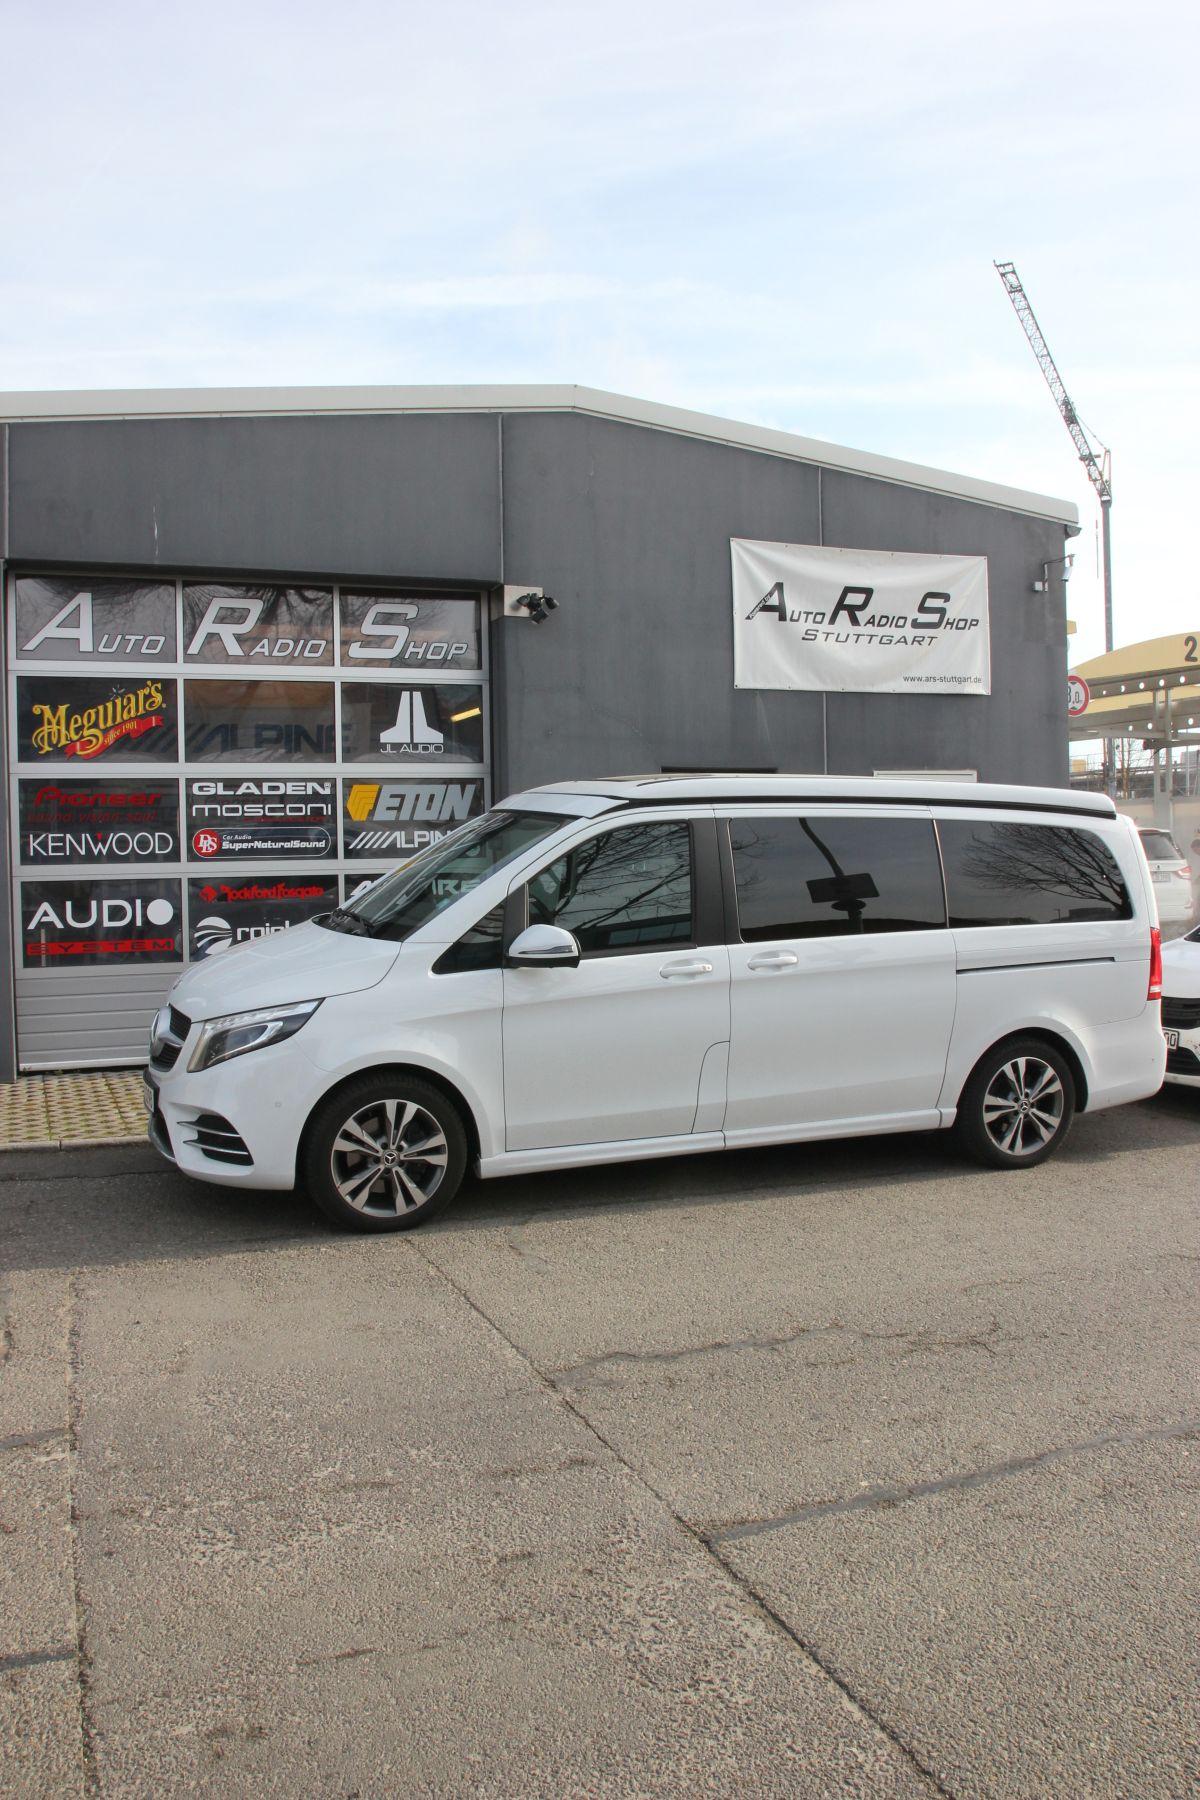 Die Mercedes V-Klasse vor dem Auto-Radio-Shop